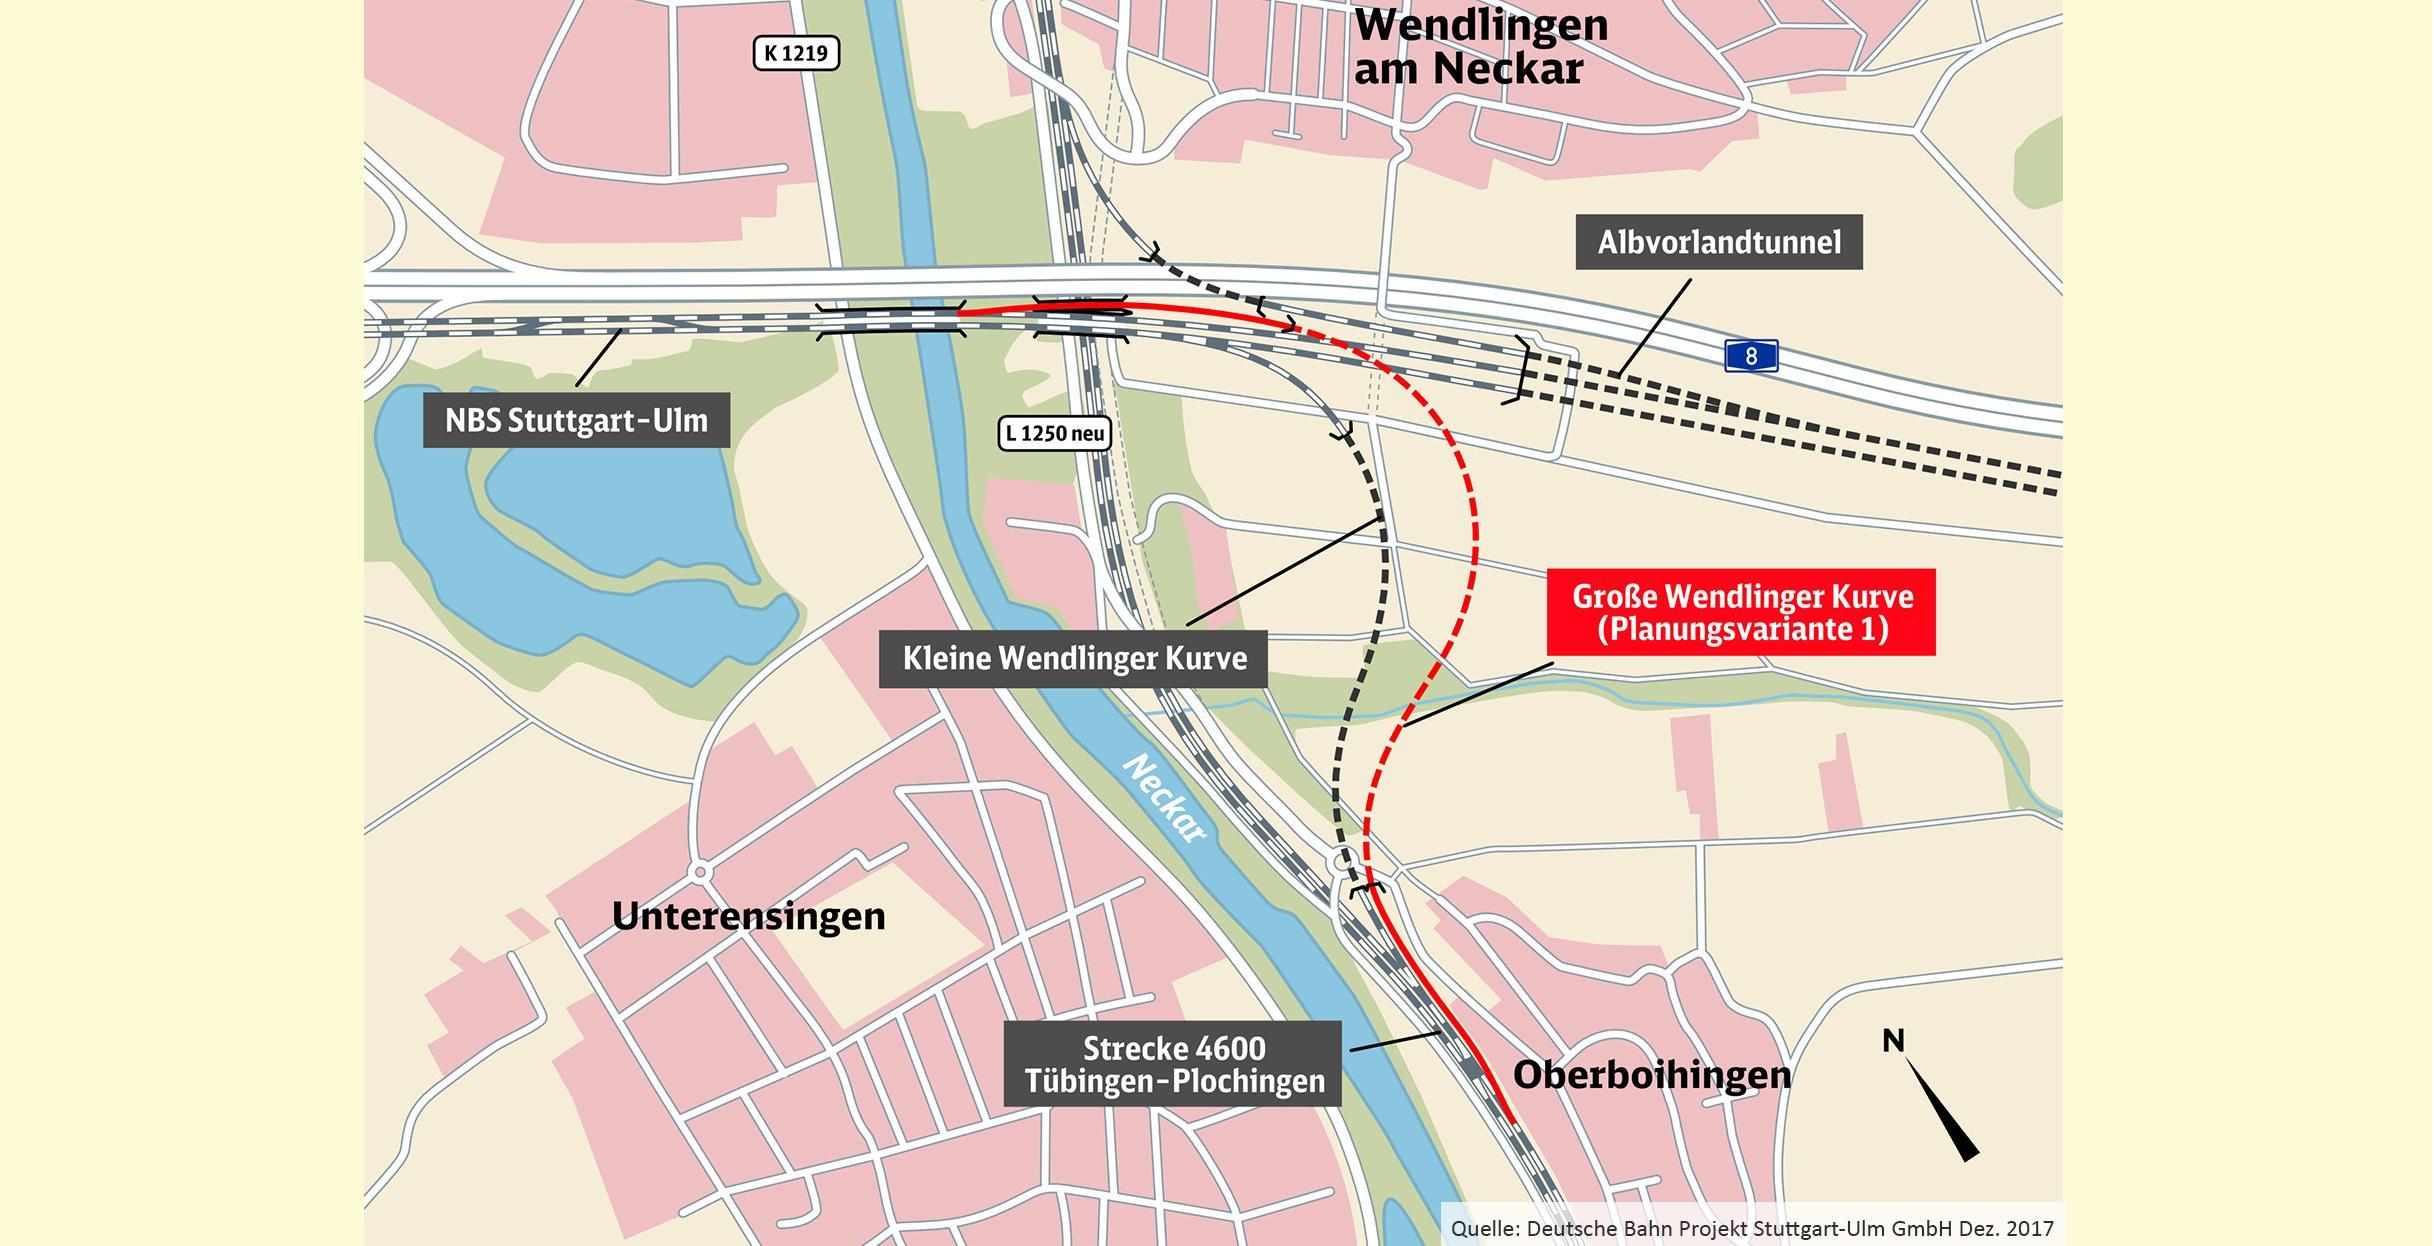 ef7dc4d137e282 Große Wendlinger Kurve (Graphik  Deutsche Bahn Projekt Stuttgart-Ulm GmbH  Dez. 2017